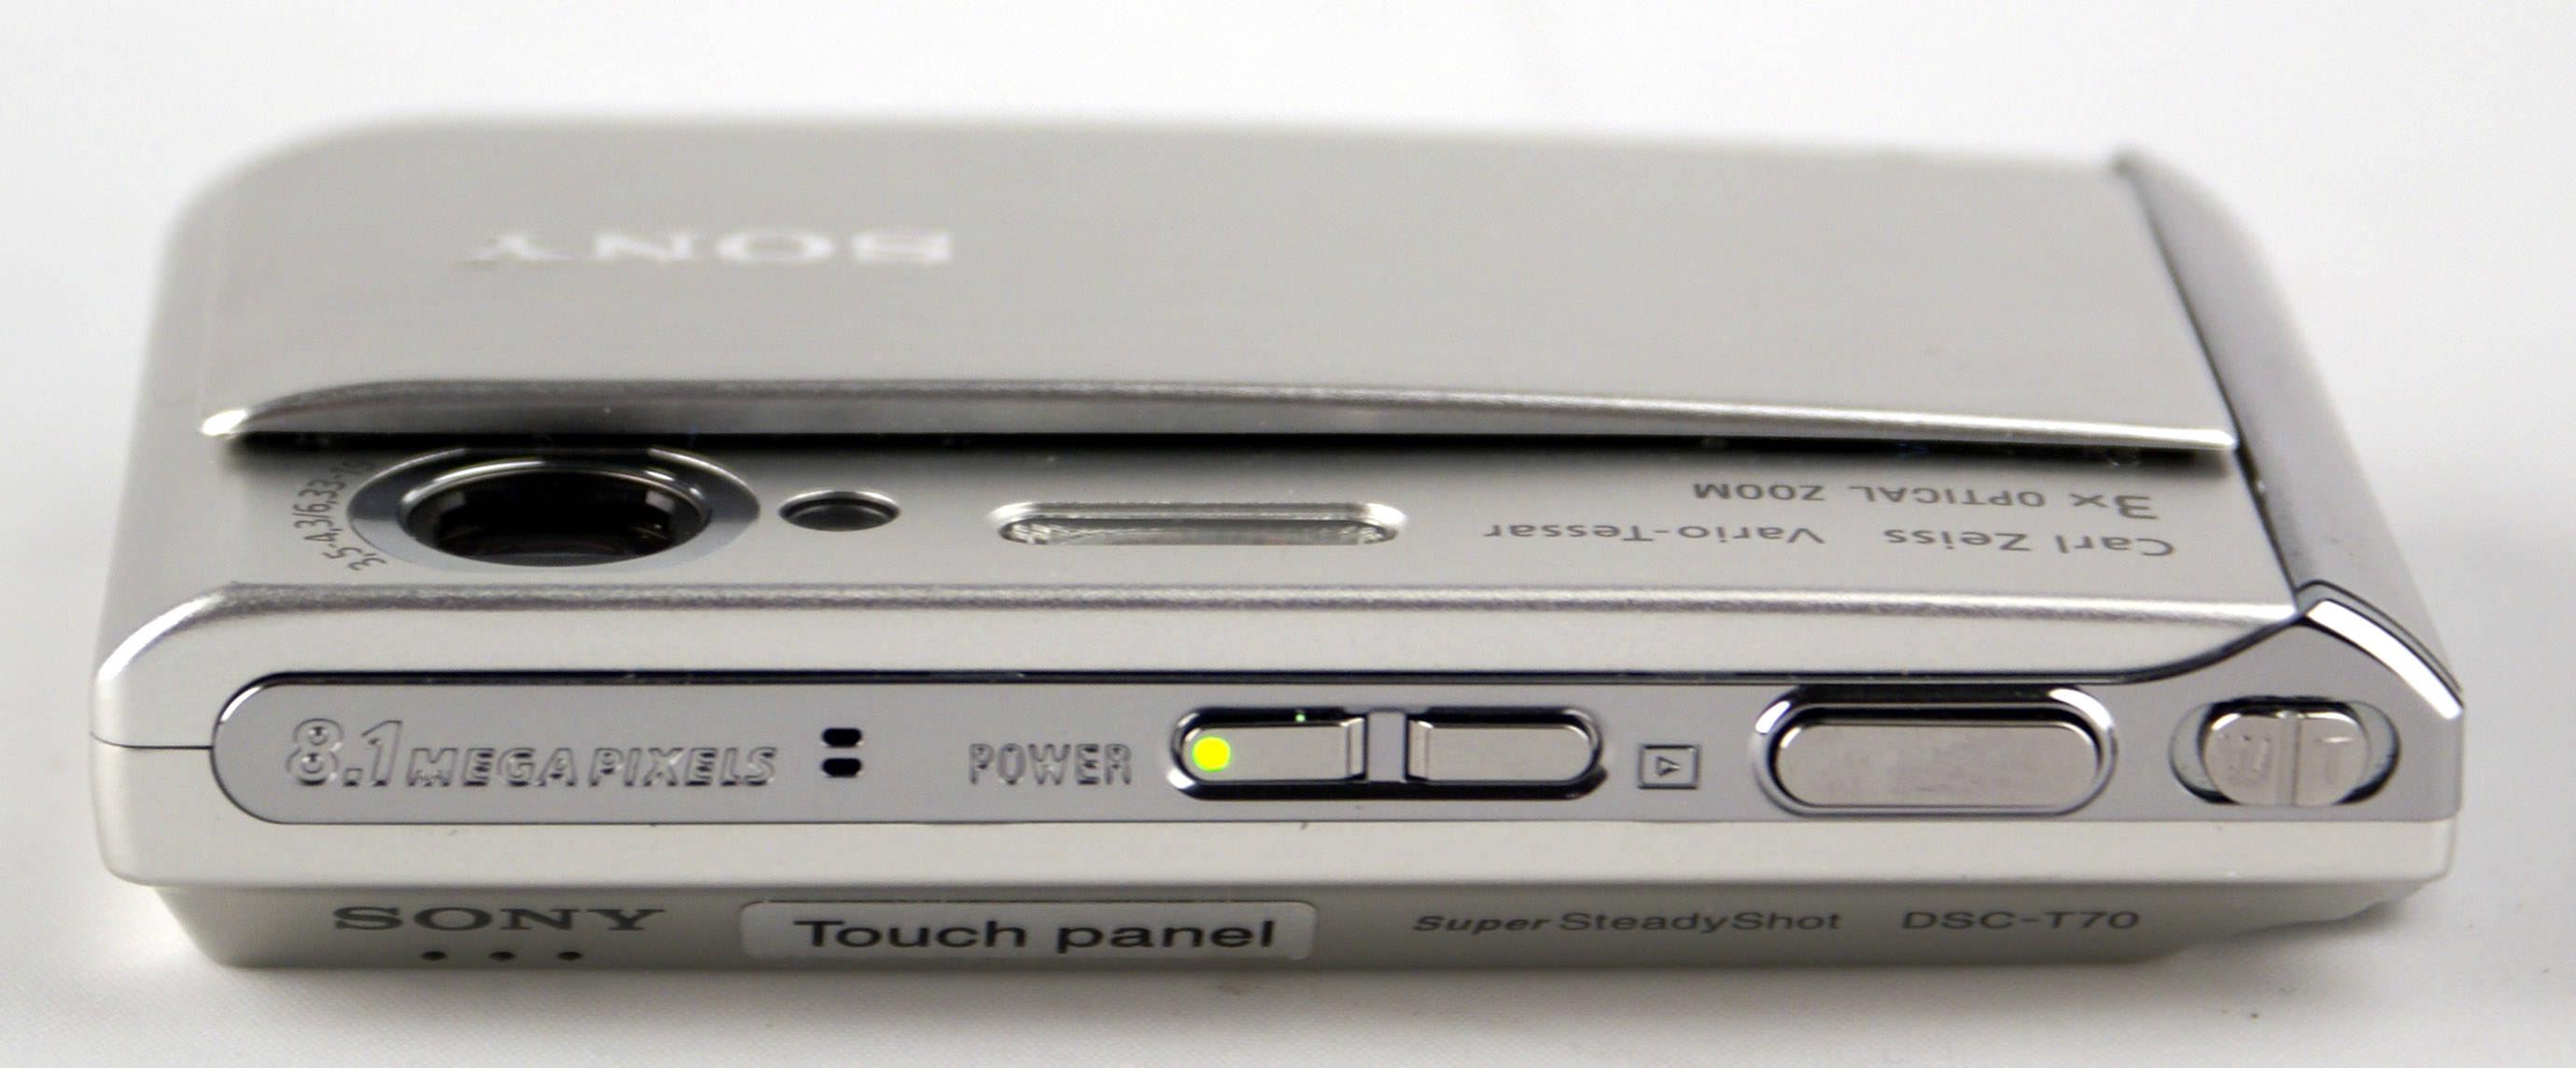 Sony DSC-H5 Review